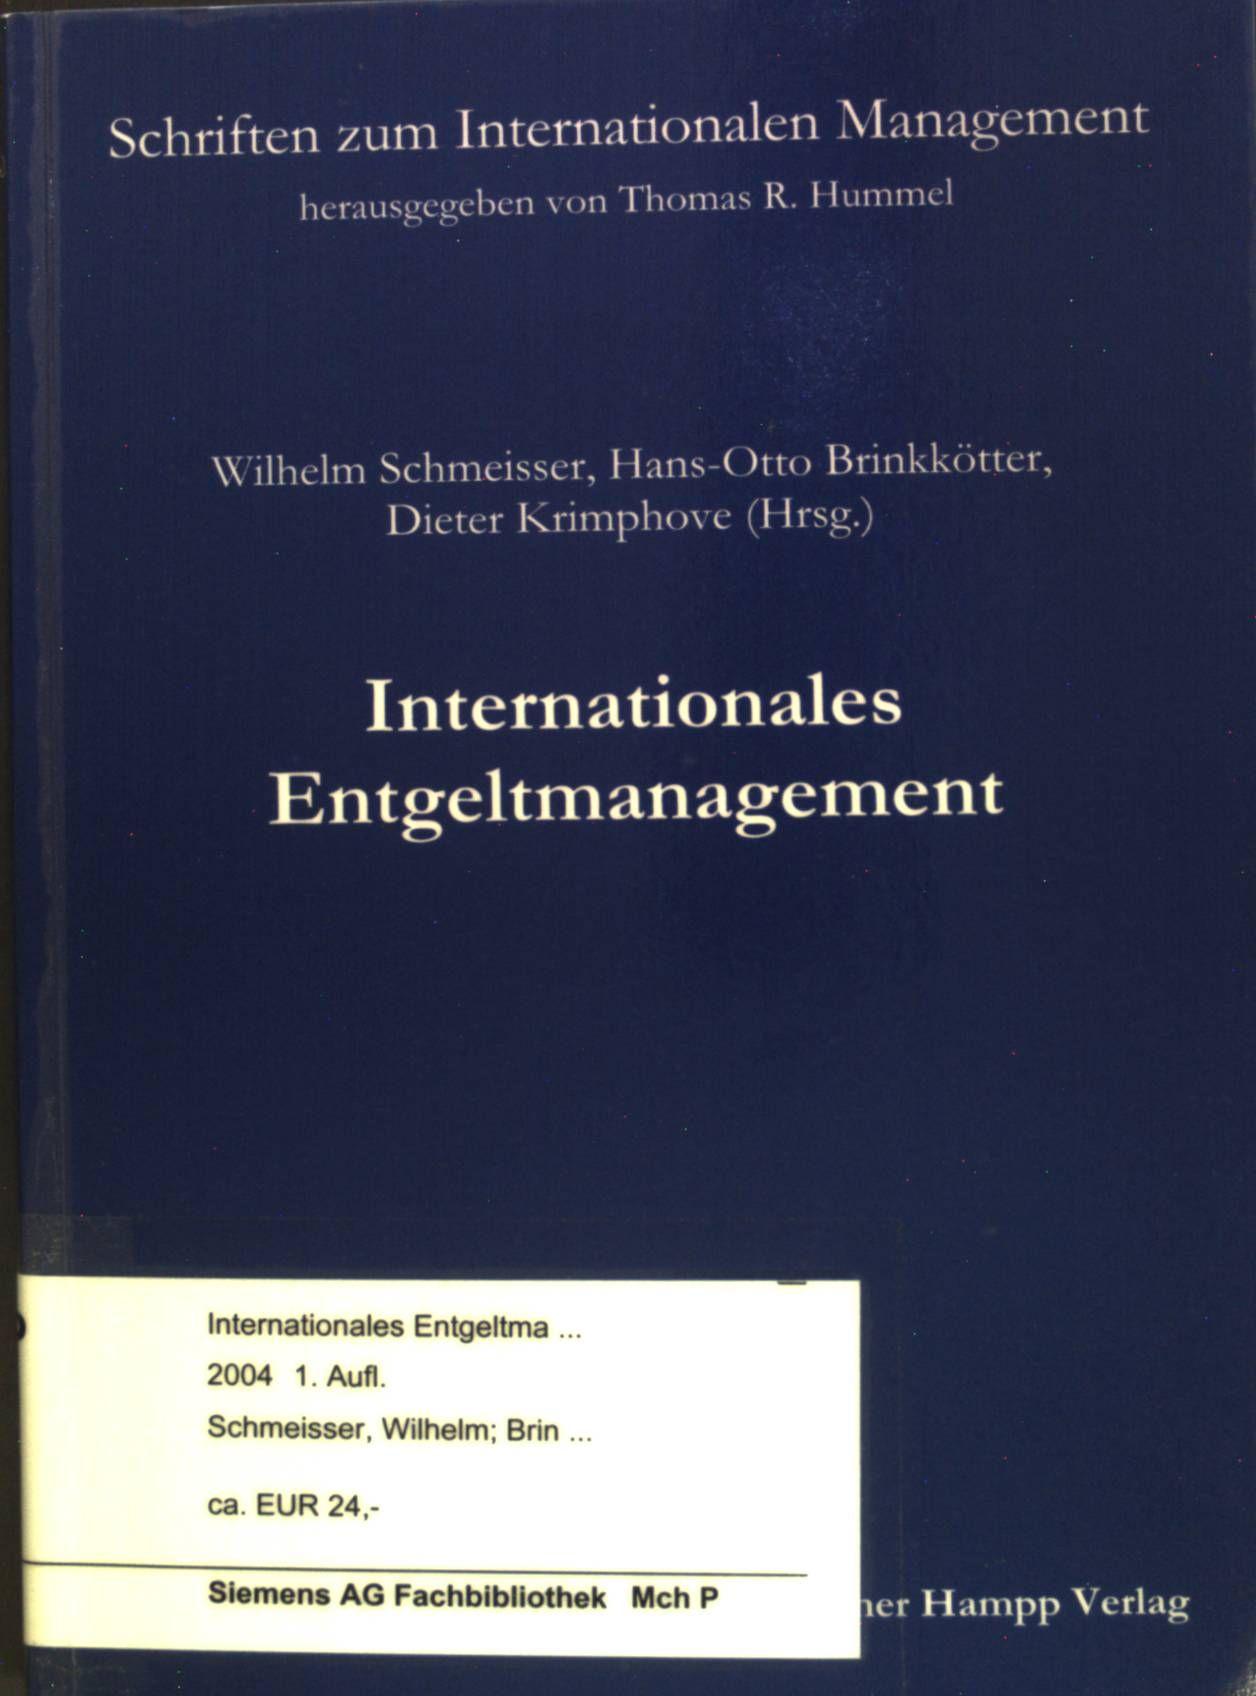 Internationales Entgeltmanagement. Schriften zum Internationalen Management Band 4. - Schmeisser, Wilhelm